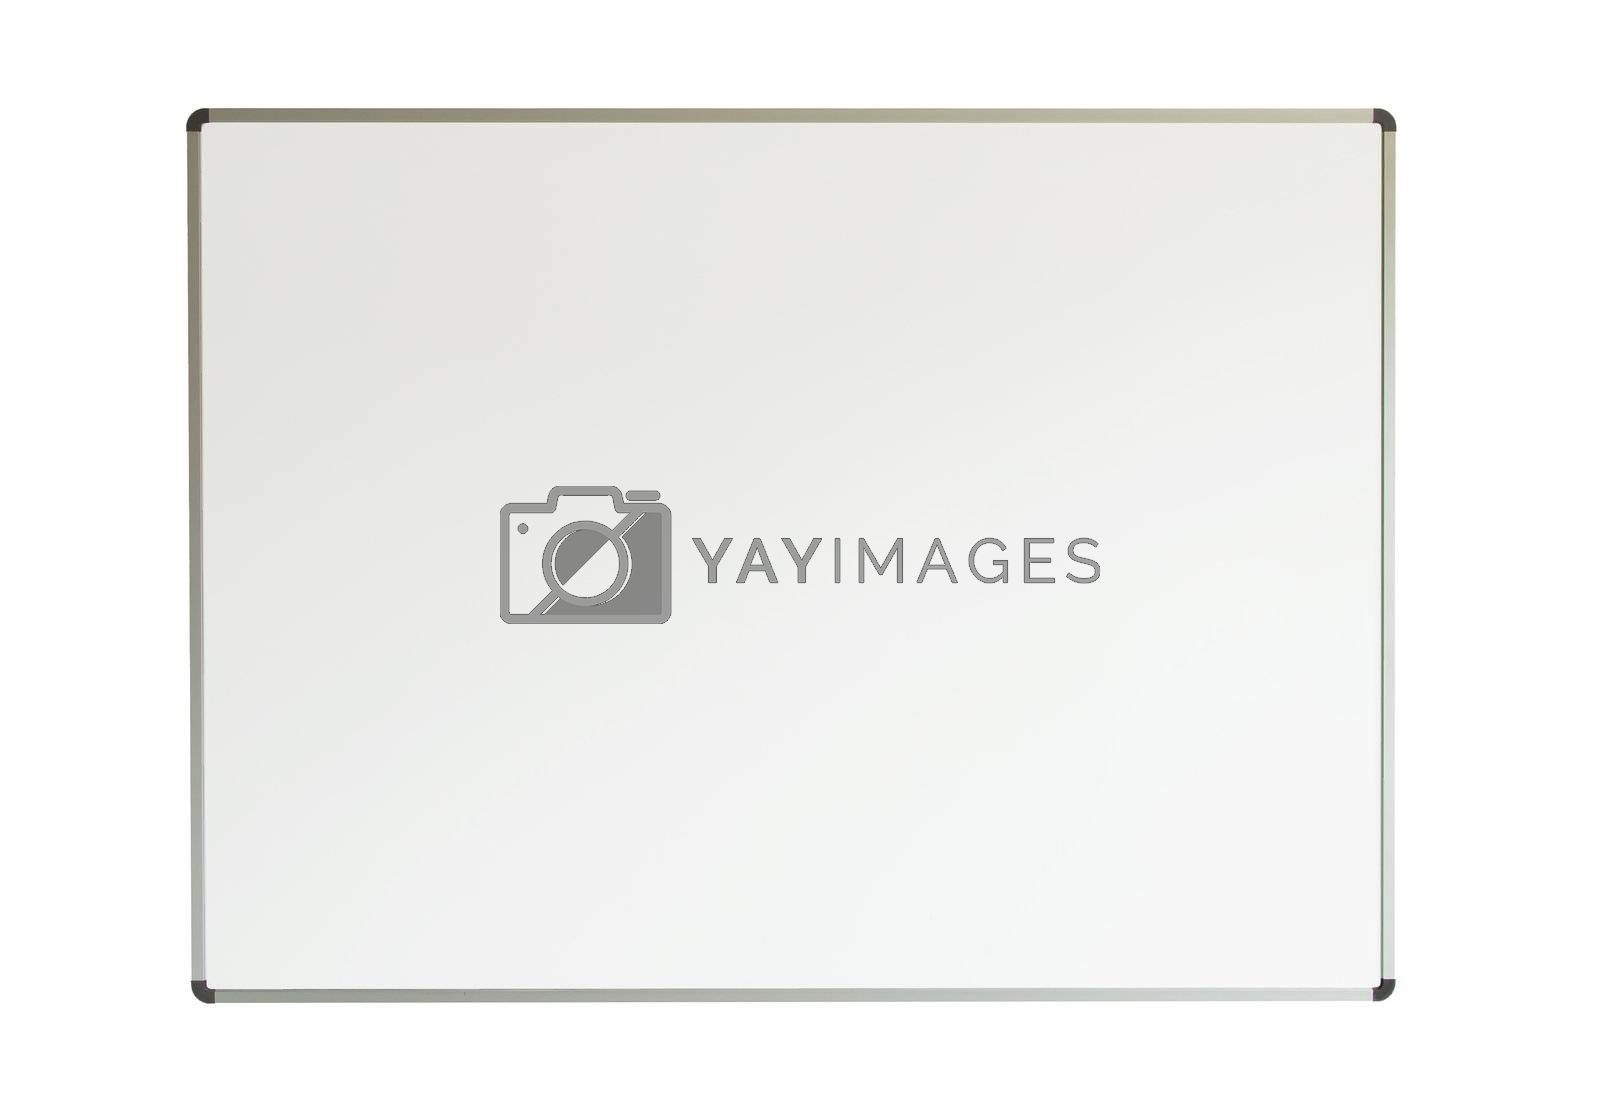 Large whiteboard isolated on a white background